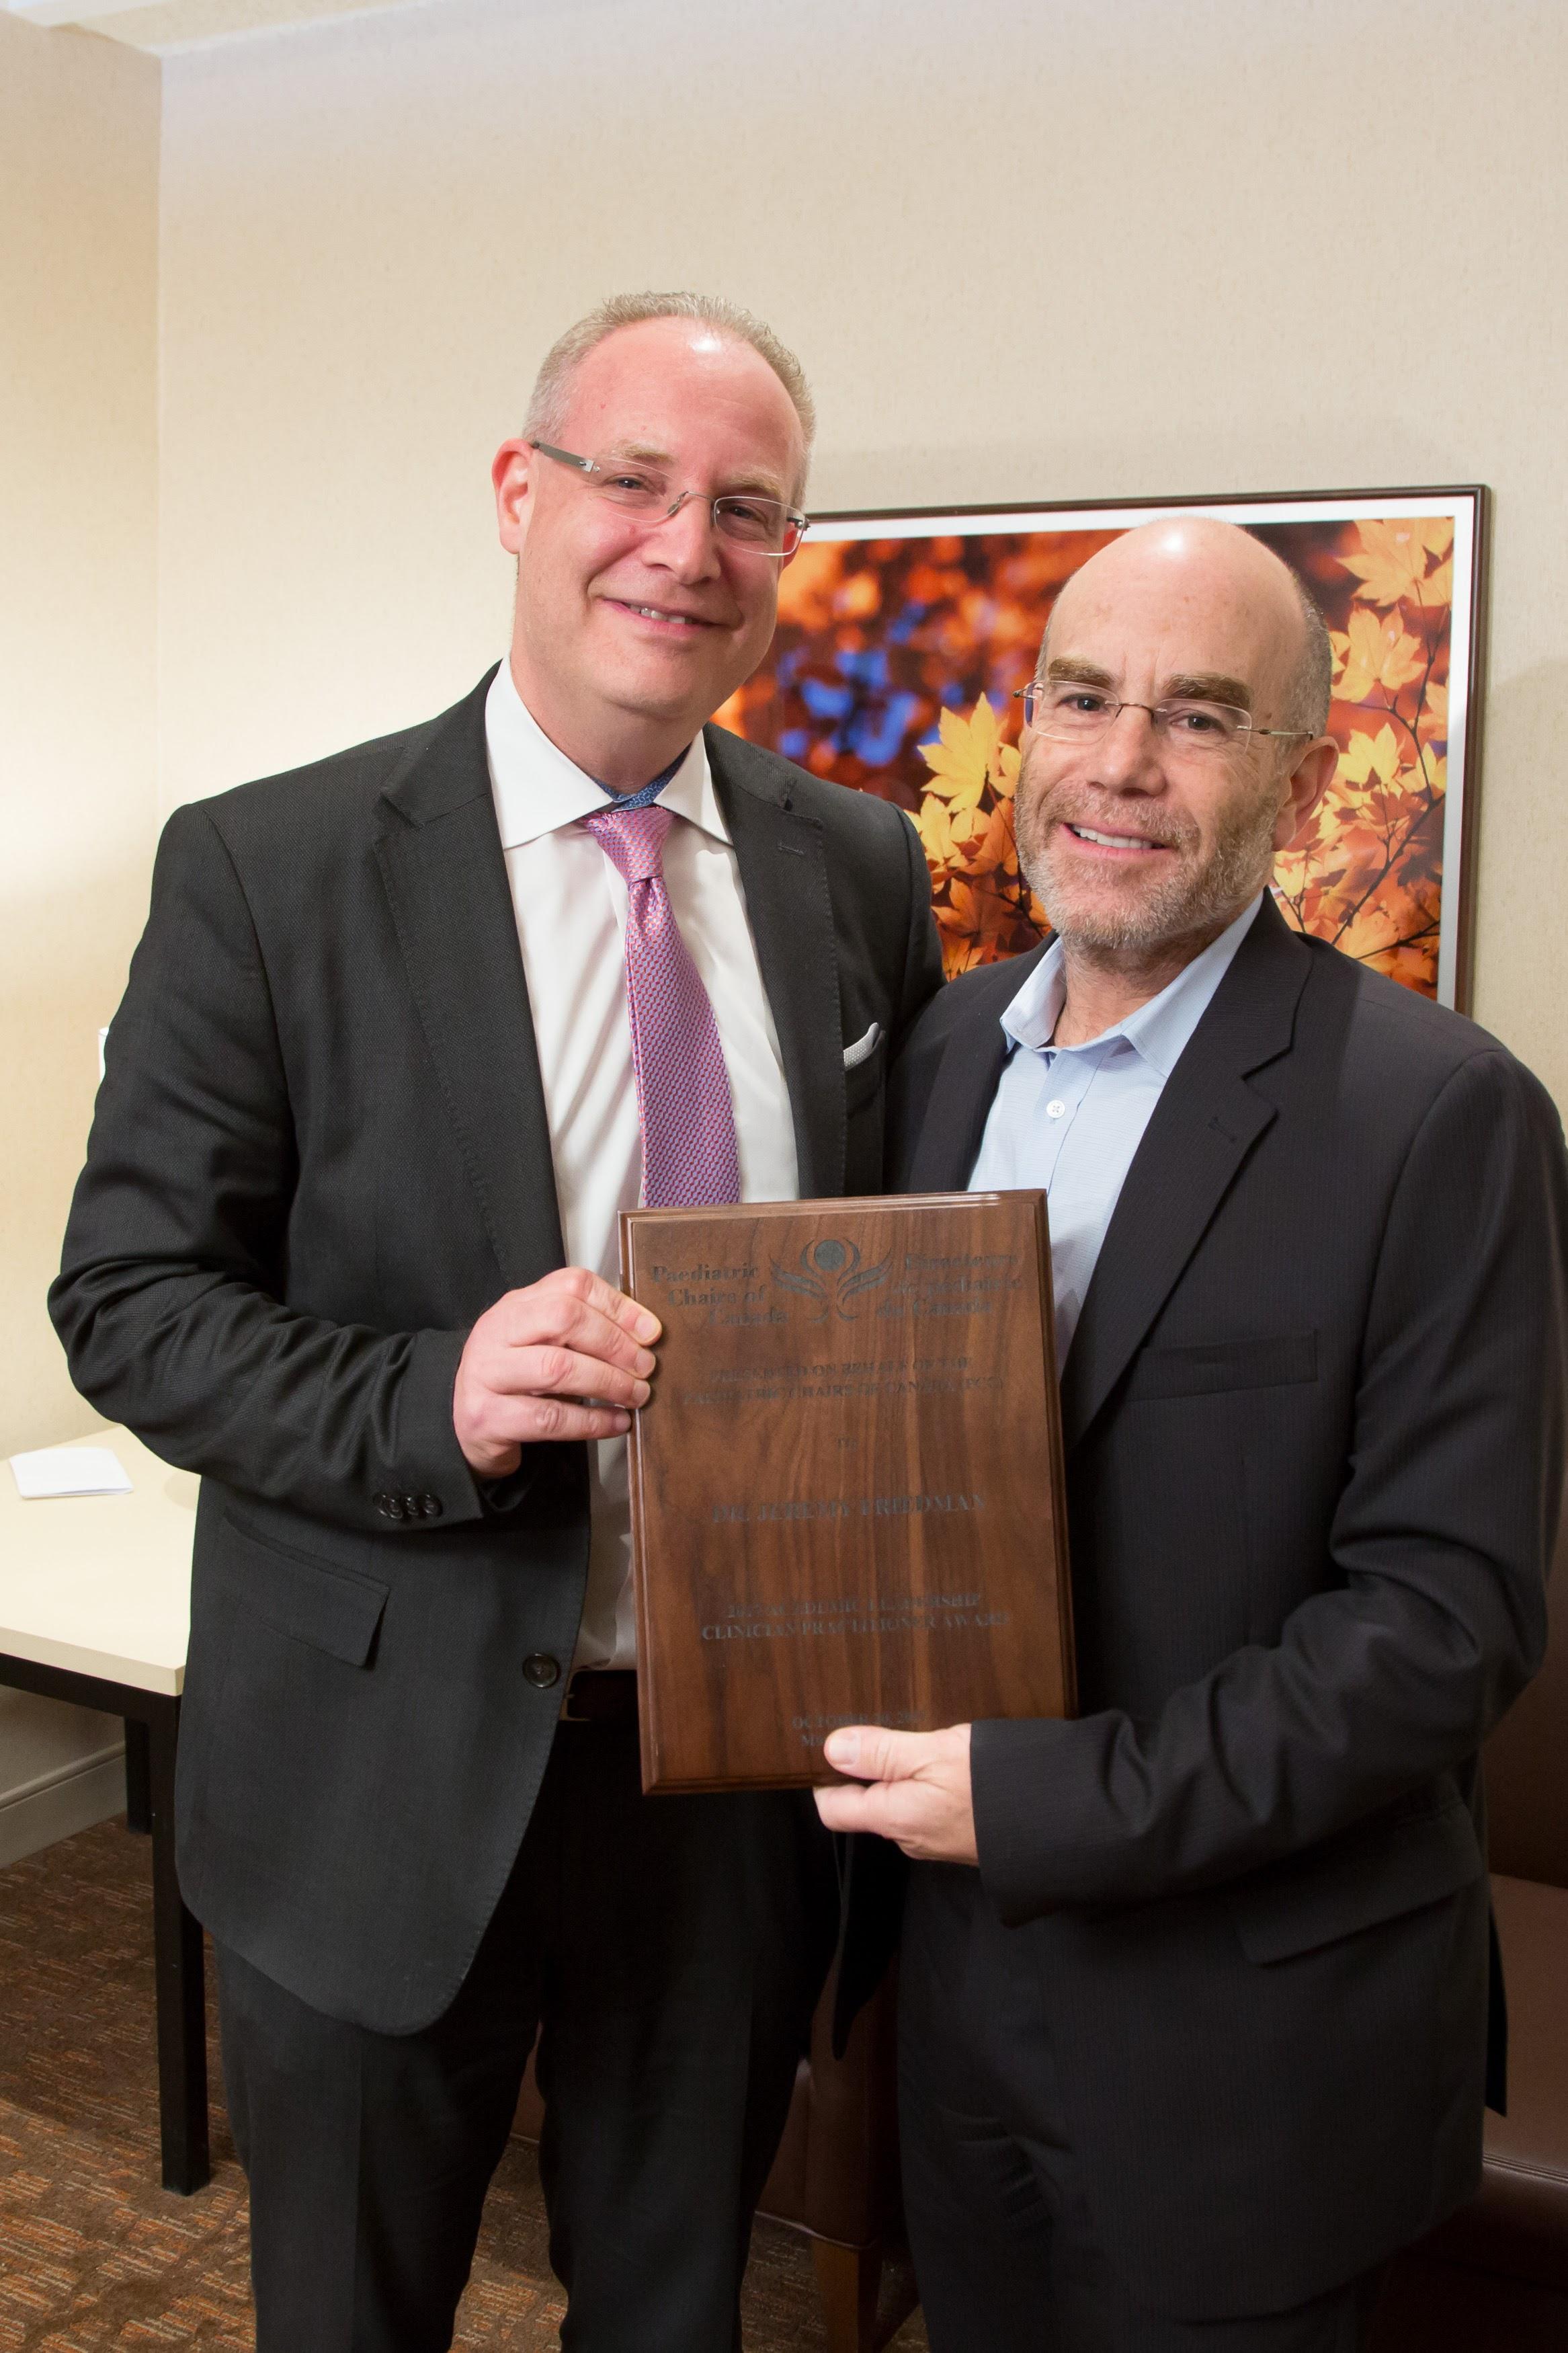 Dr. Ronald Cohn and Dr. Jeremy Friedman (Clinician Practitioner - University of Toronto/SickKids)